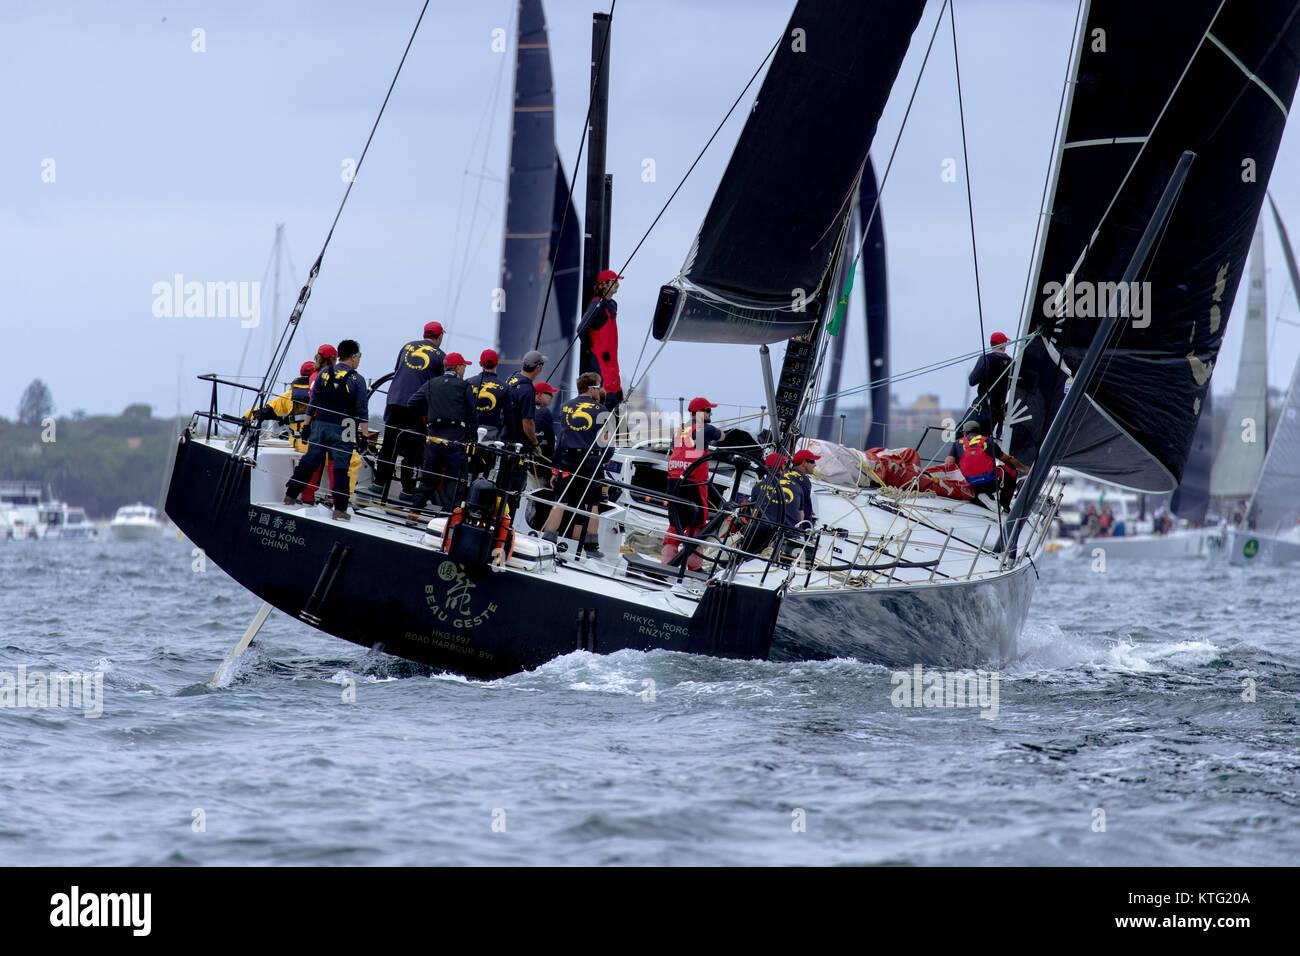 Sydney, Australia. 26th December 2017. Rolex Sydney to Hobart Yacht Race 2017. Hong Kong owned Beau Geste pre race. - Stock Image